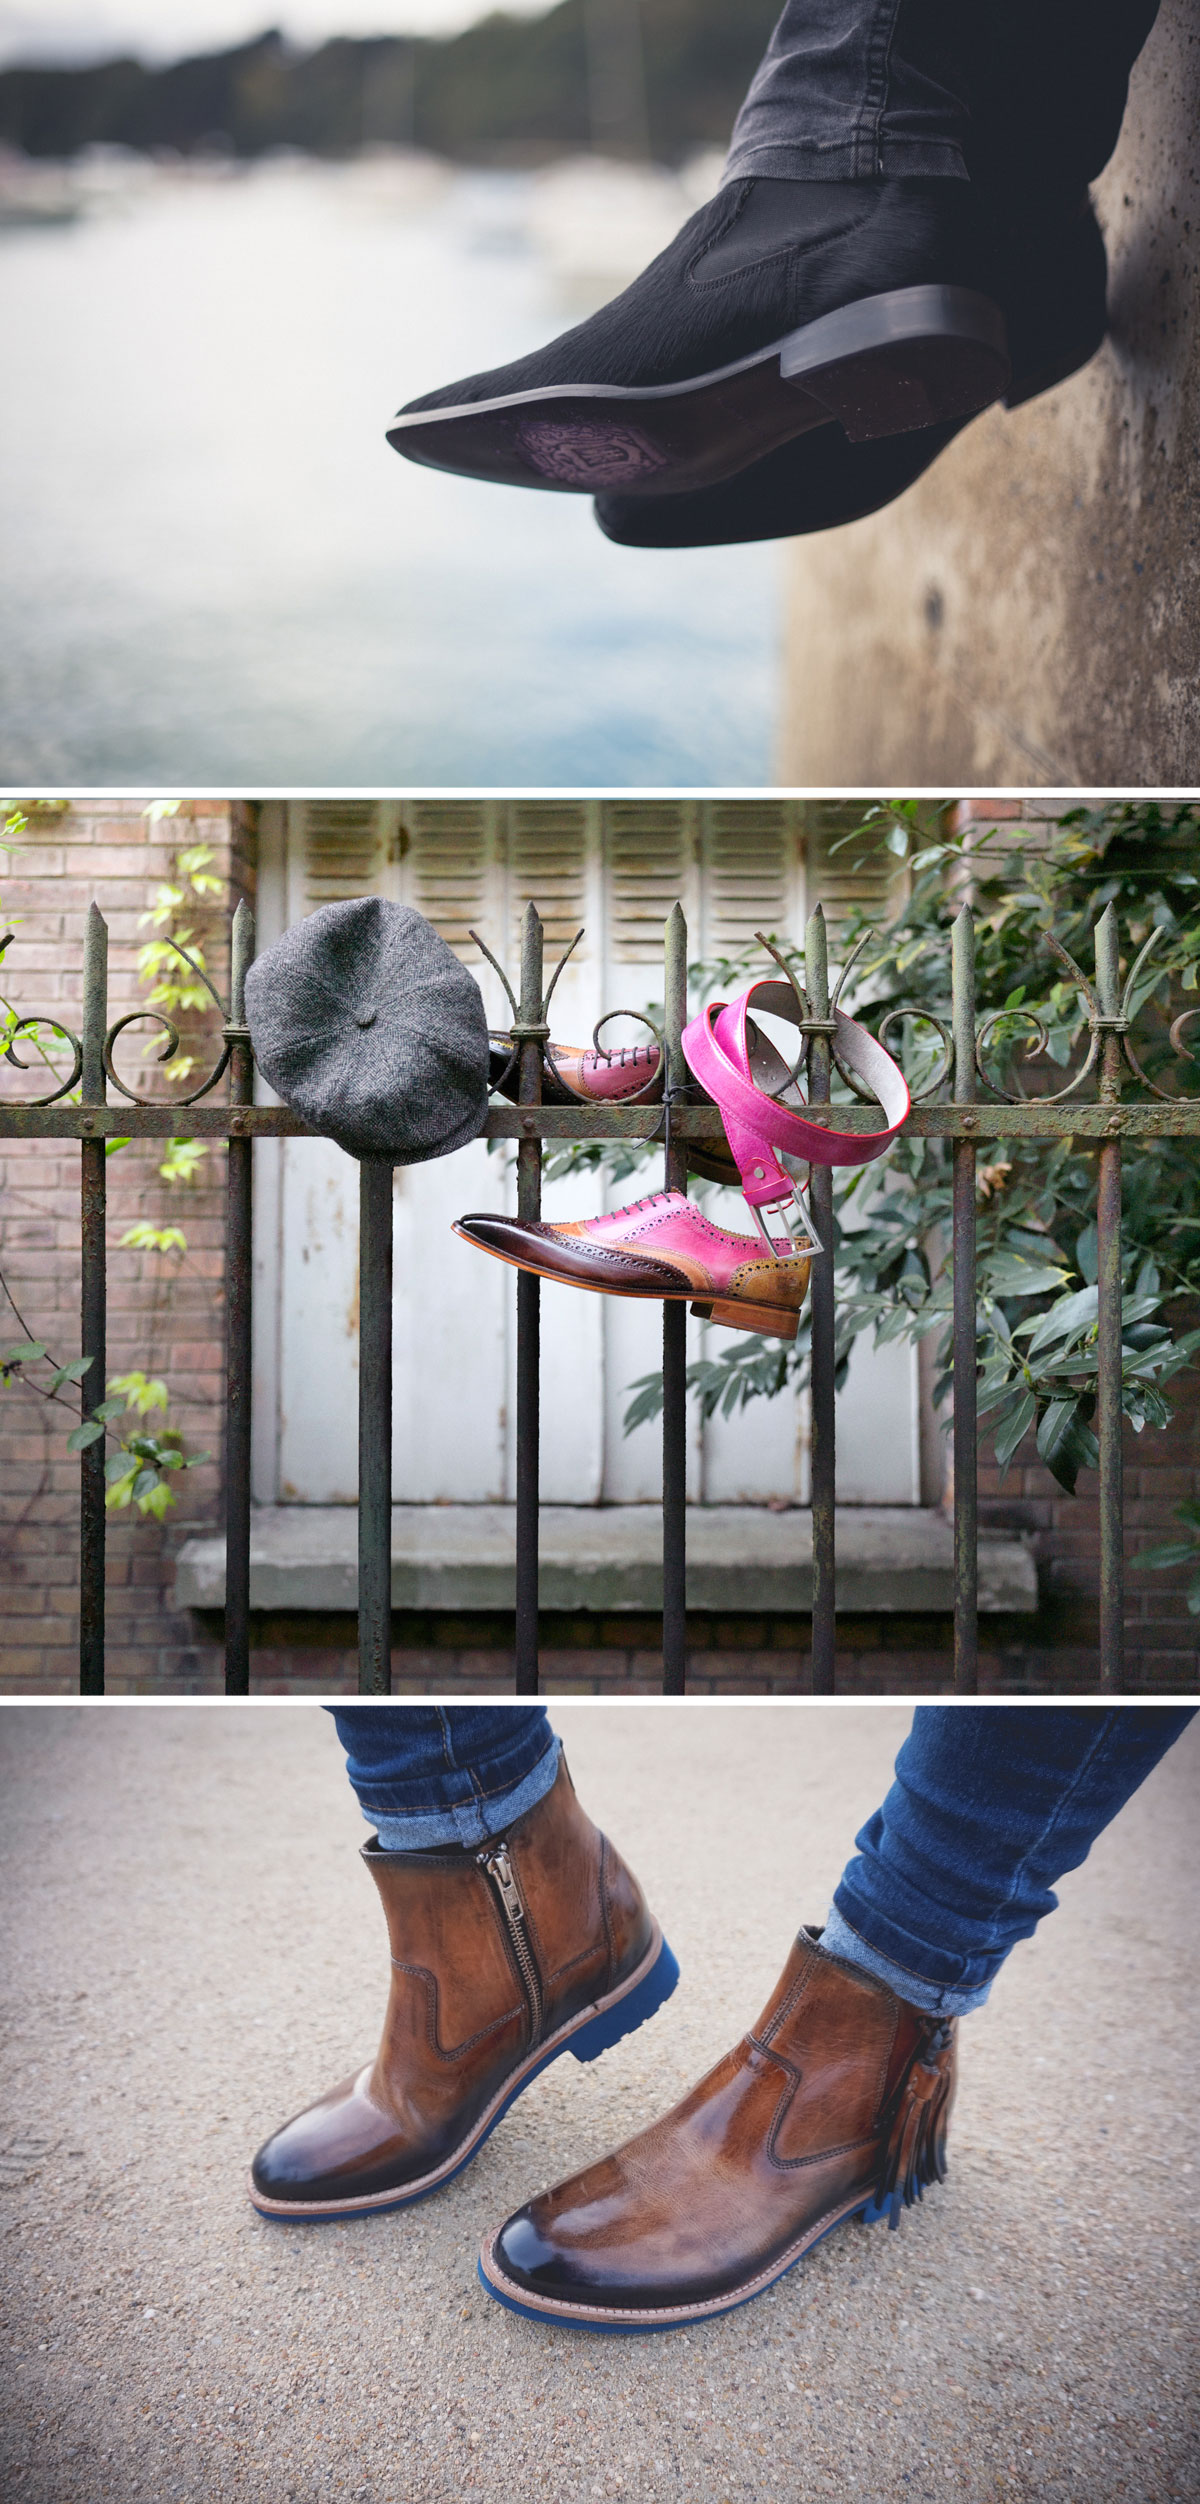 Melvin & Hamilton chaussures maroquinerie